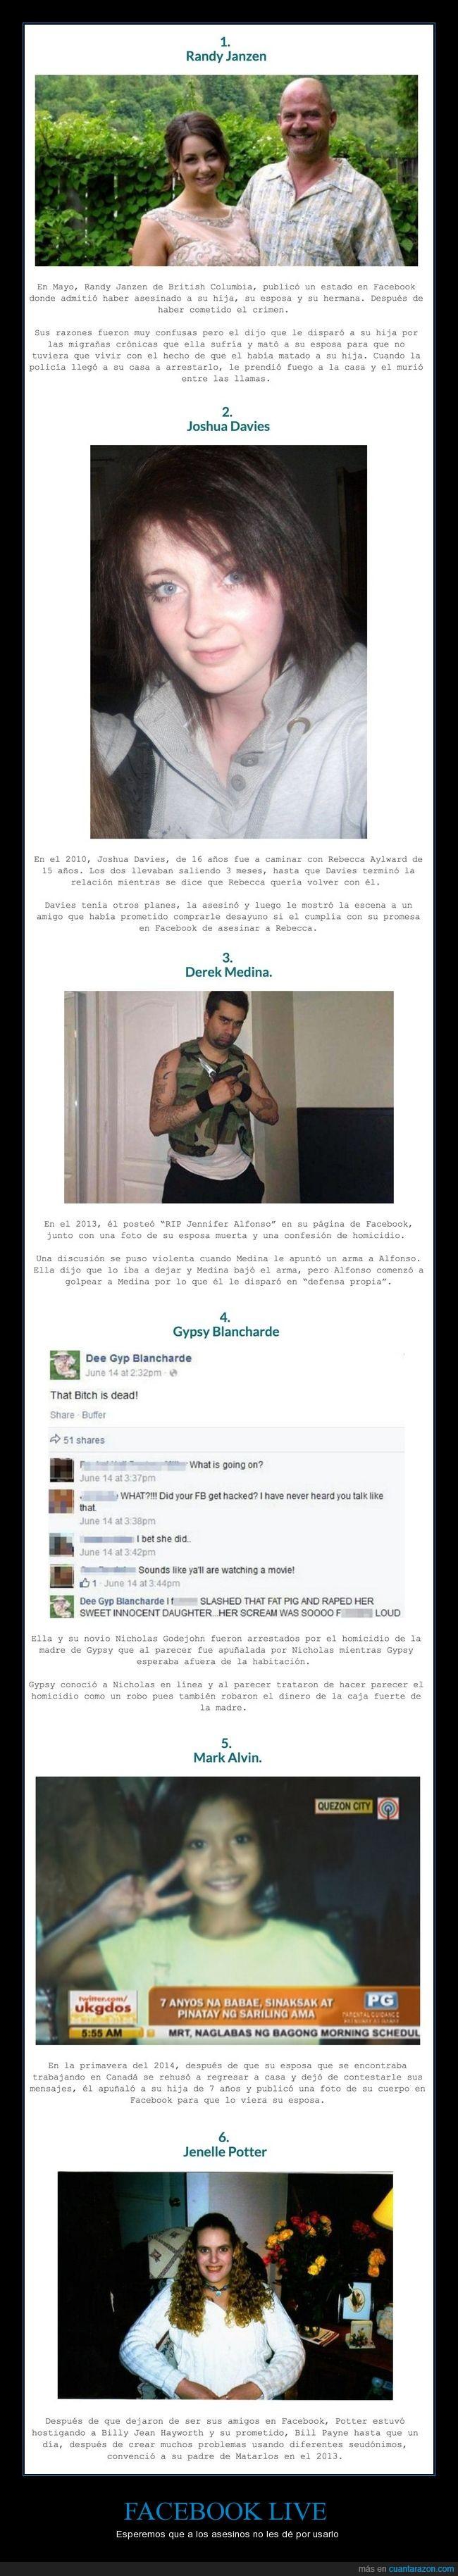 asesinos,compartir,dementes,facebook live,muertes,share